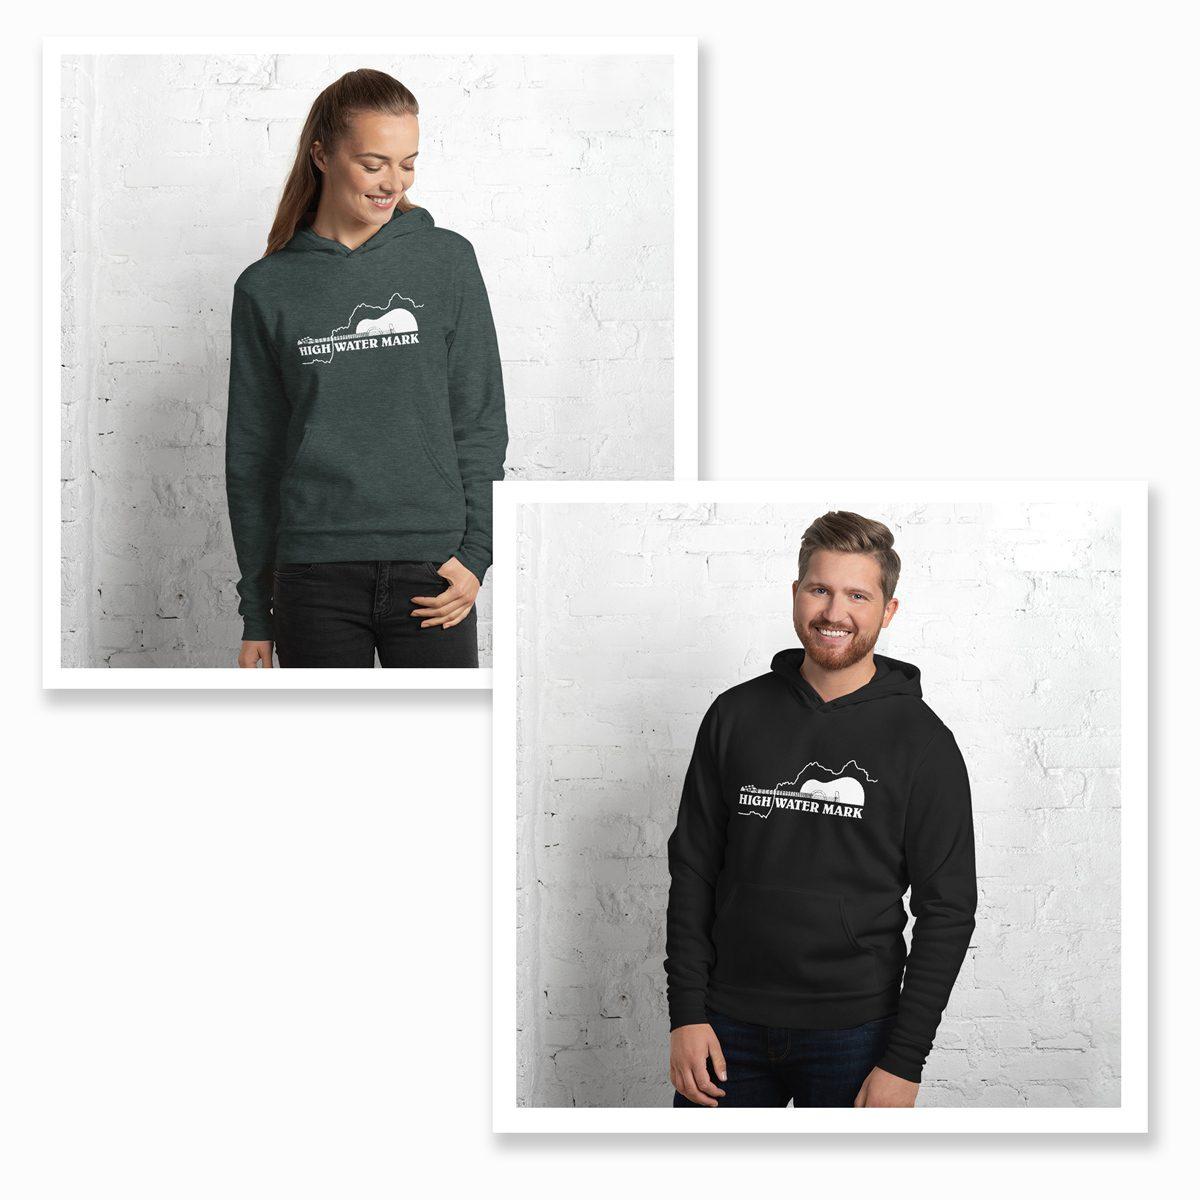 High Water Mark band hoodies